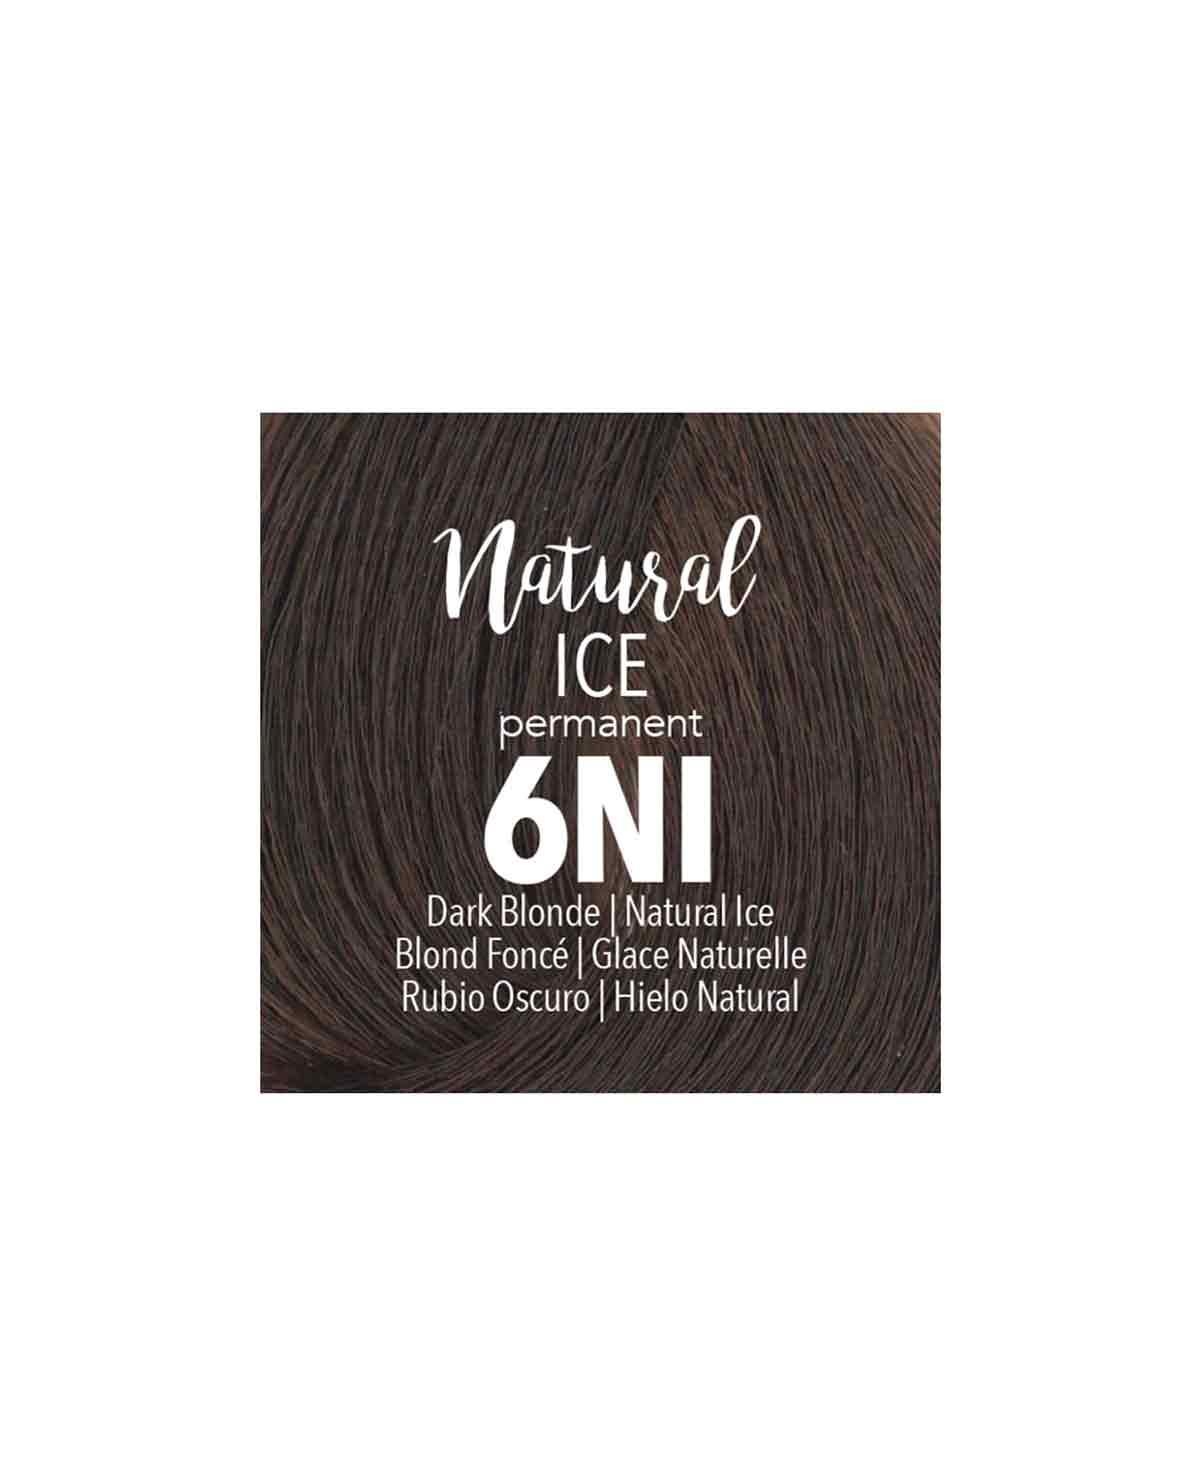 Mydentity - 6NI Dark Blonde Natural Ice